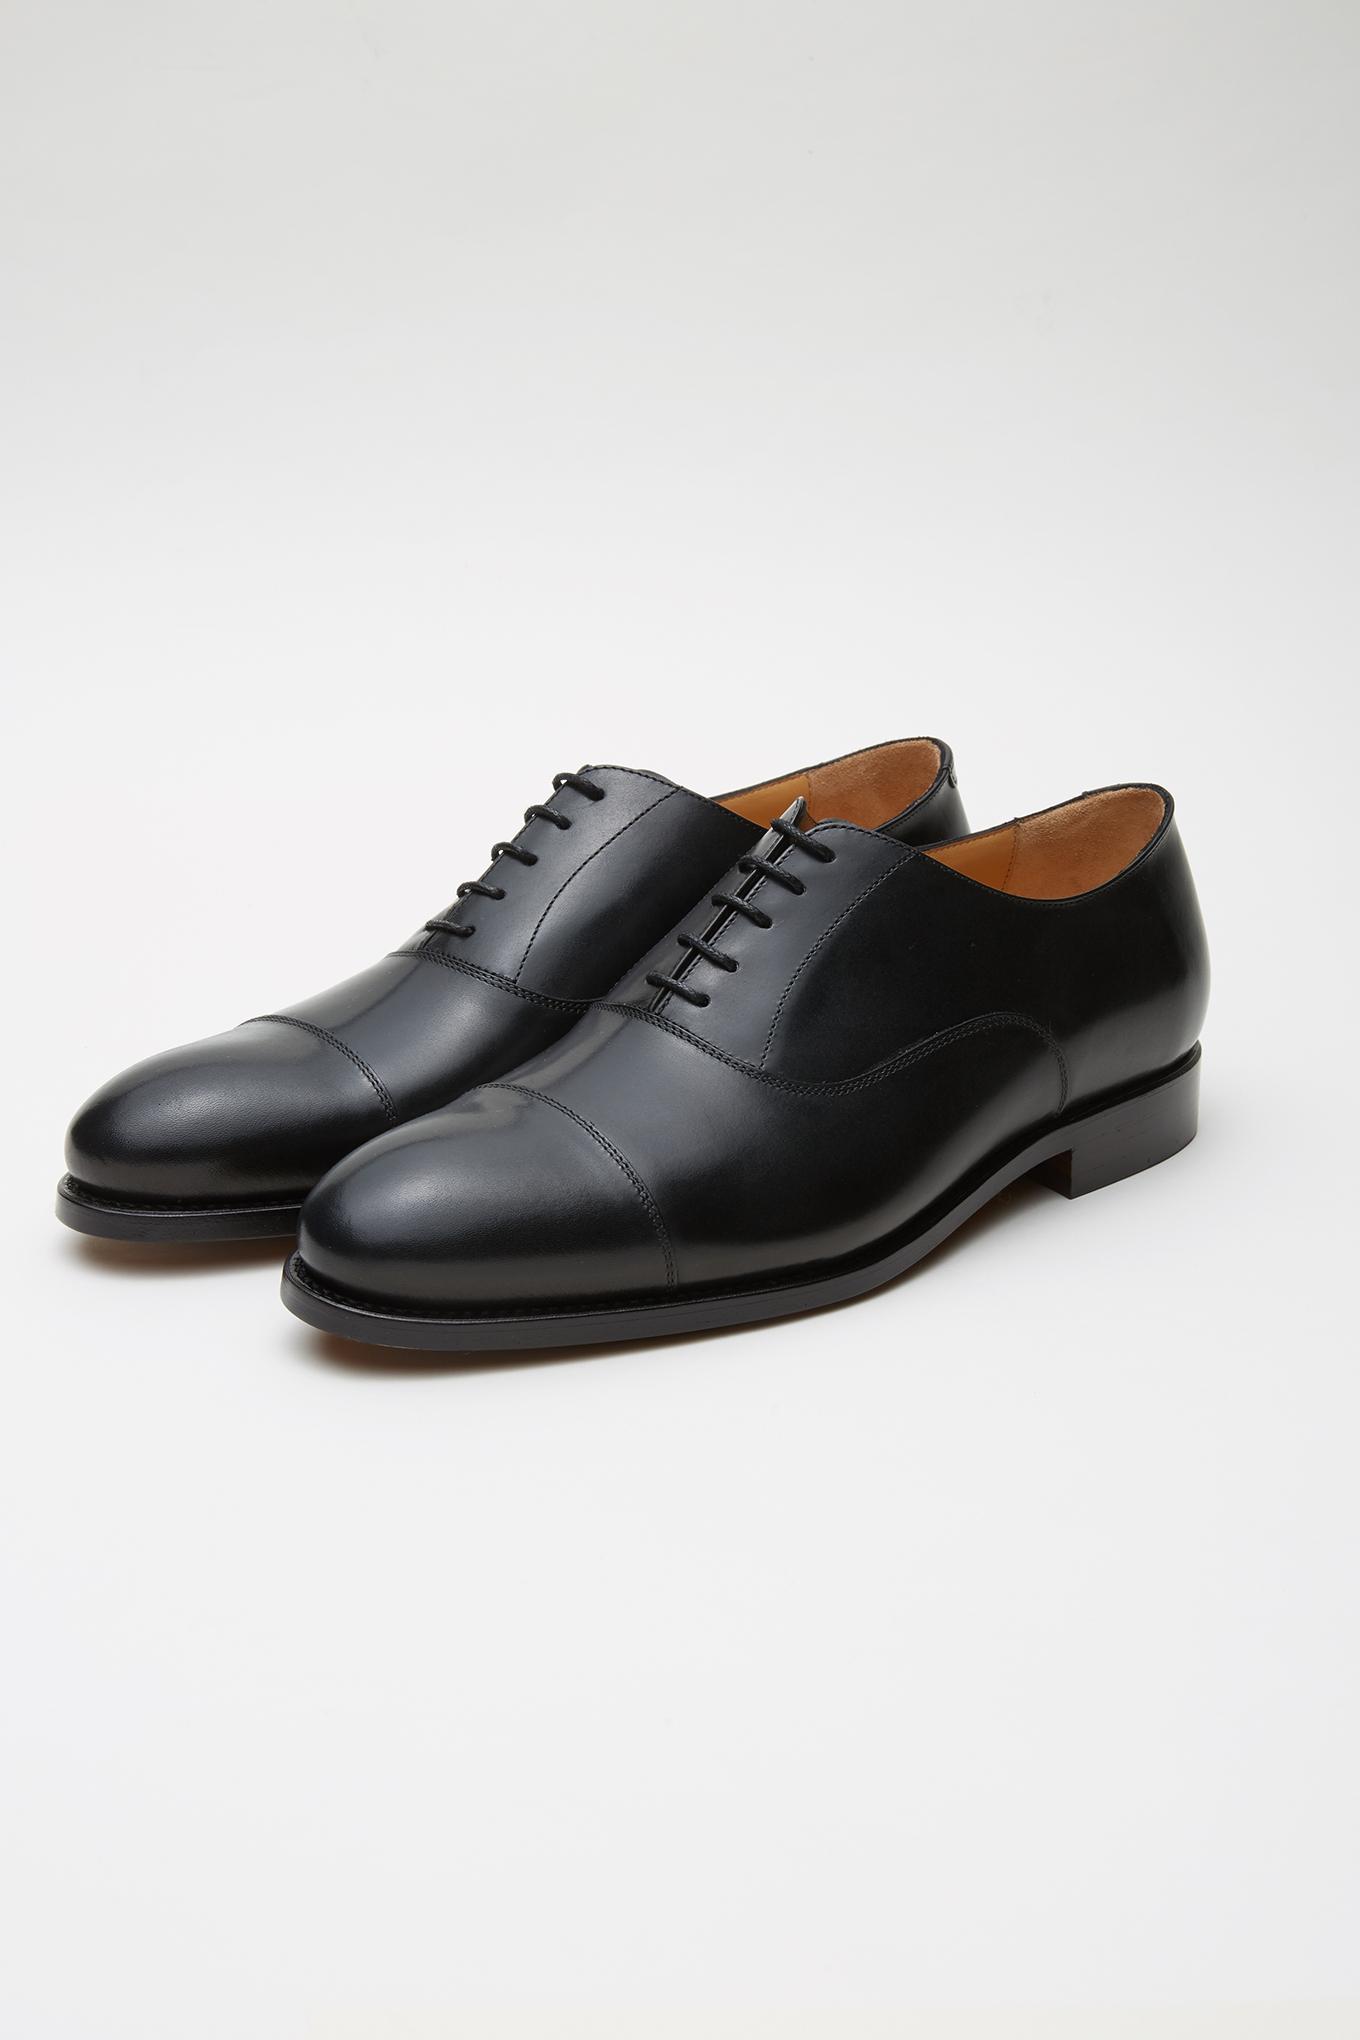 Shoes Black Classic Man